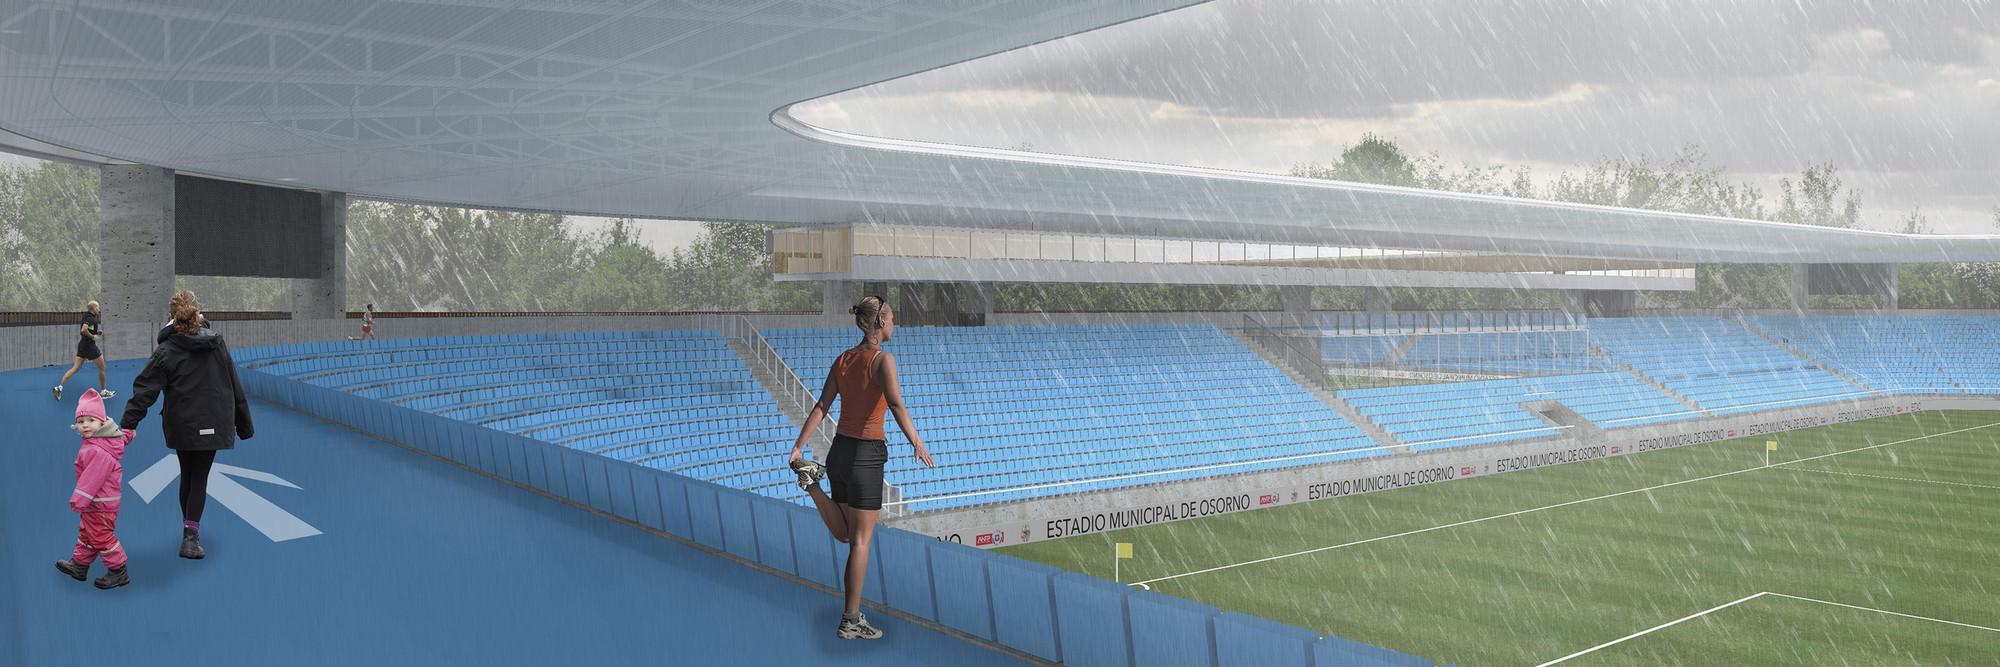 Original further Taa Estadio Osorno additionally E A D Fe A Org in addition Original furthermore Sistersisland Djw. on original